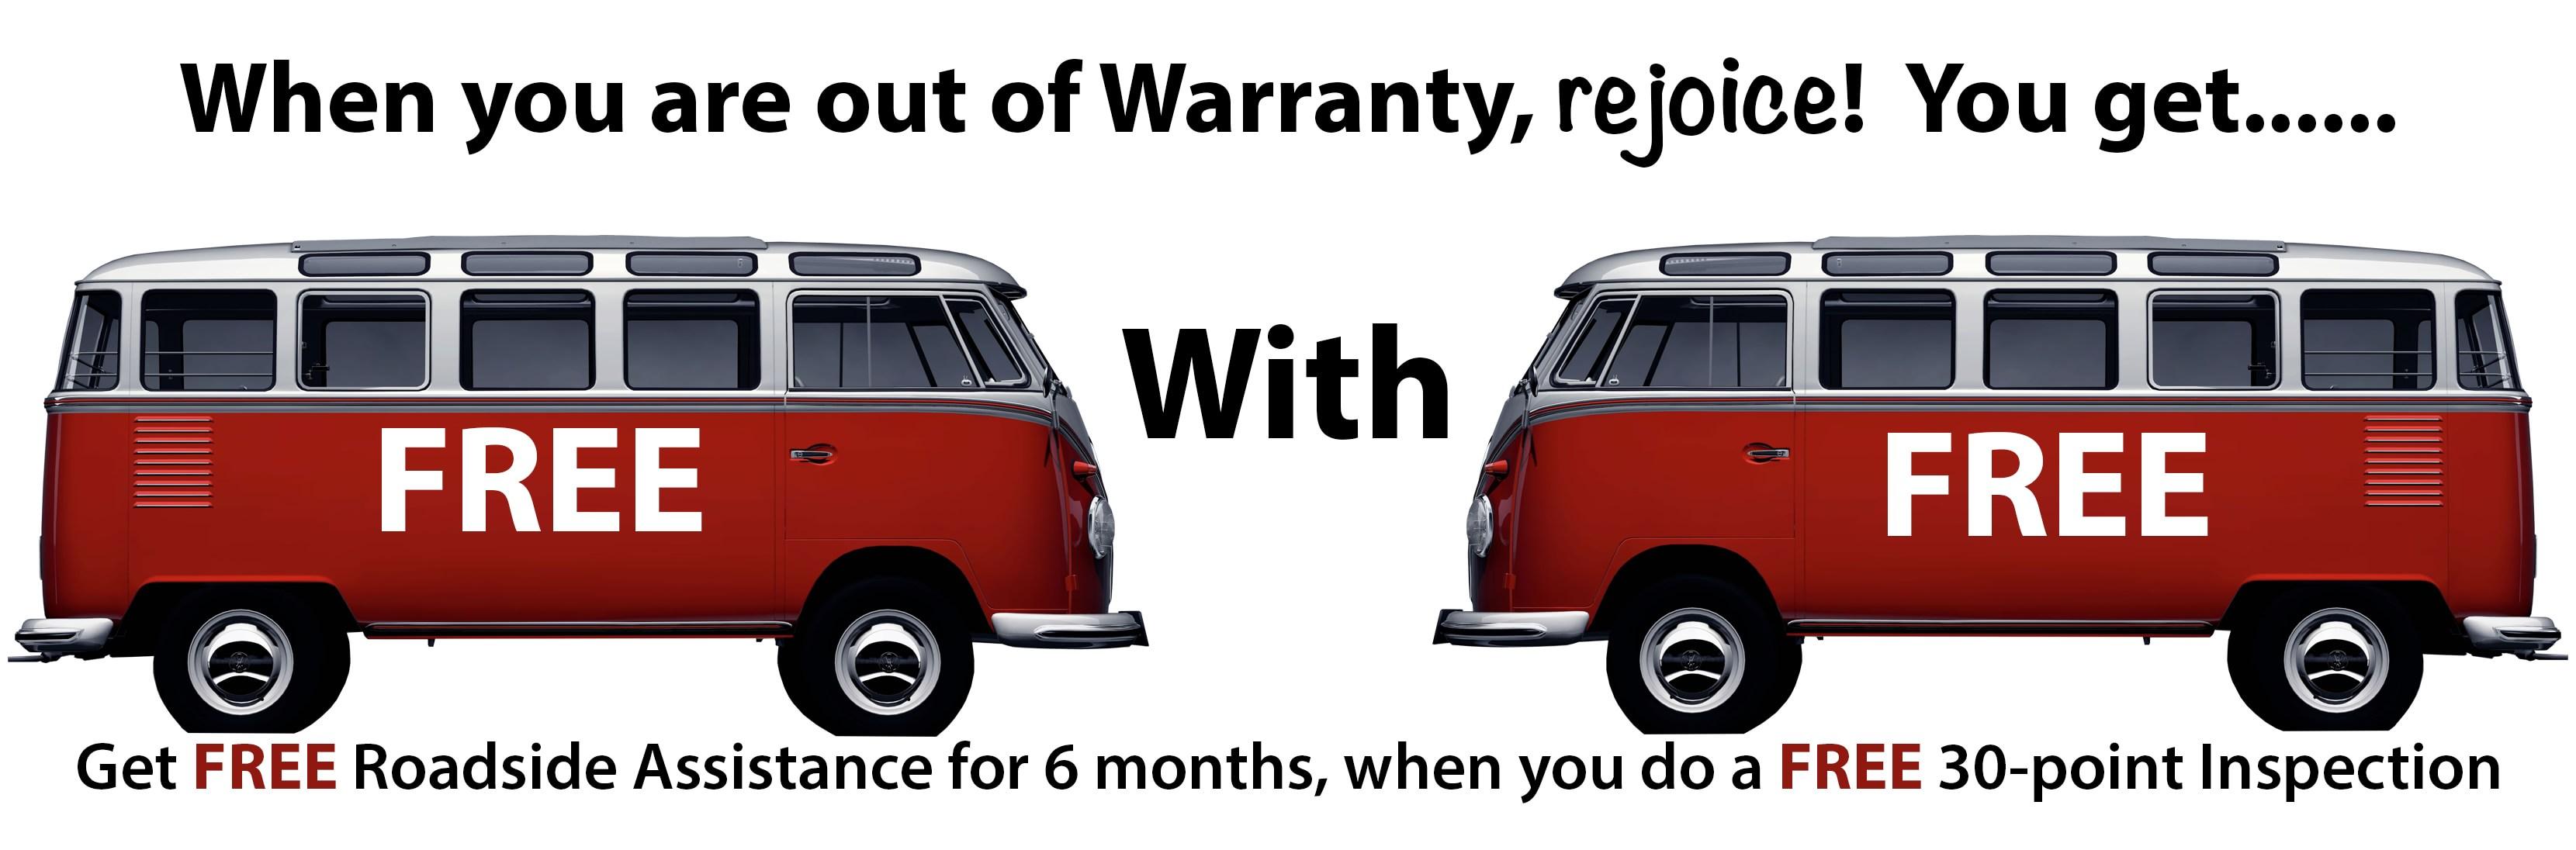 free volkswagen roadside assistance for you